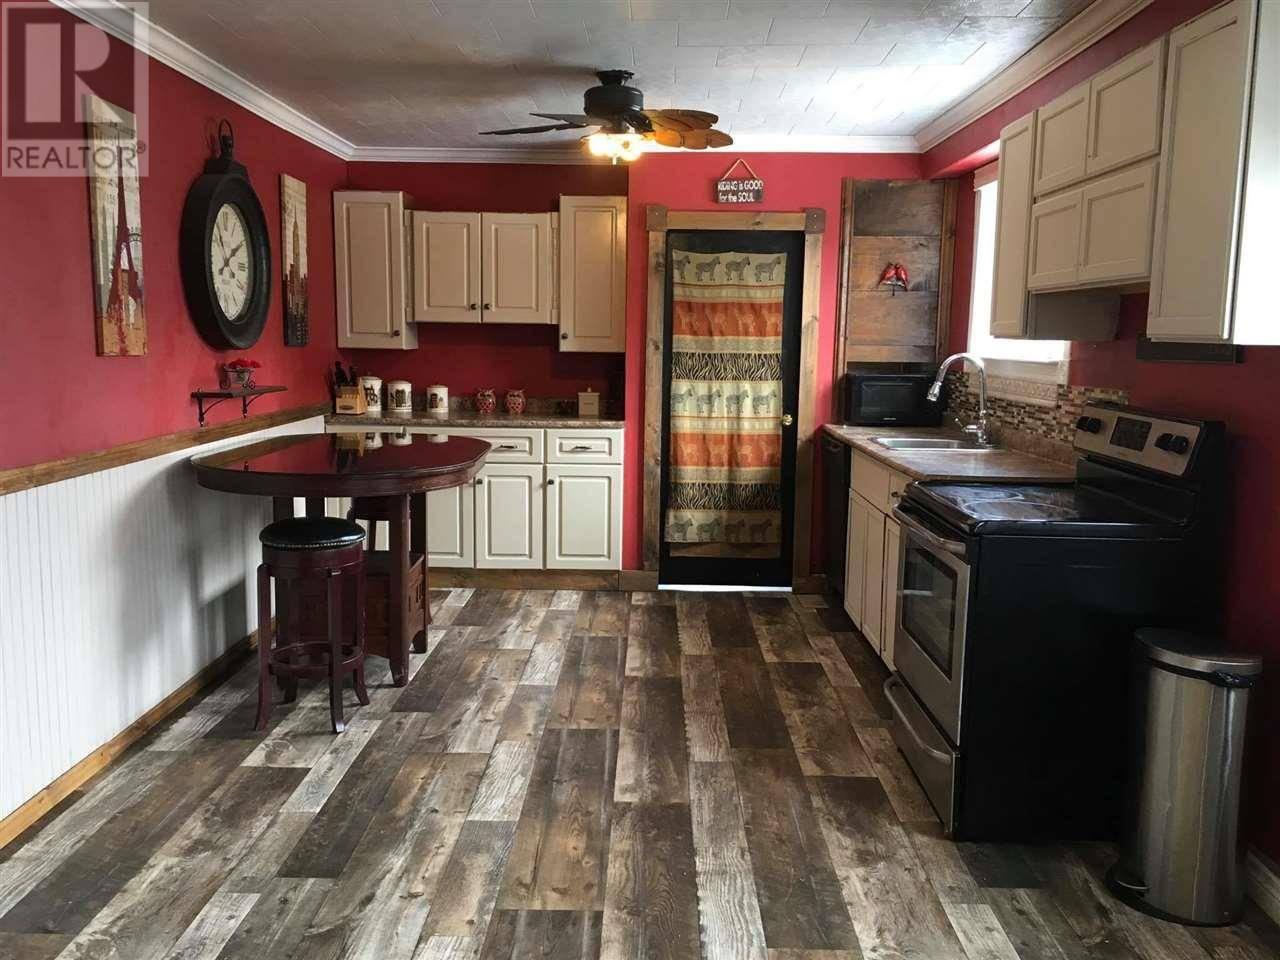 House for sale at 130 Greenhill Dr Sydney River Nova Scotia - MLS: 202006513